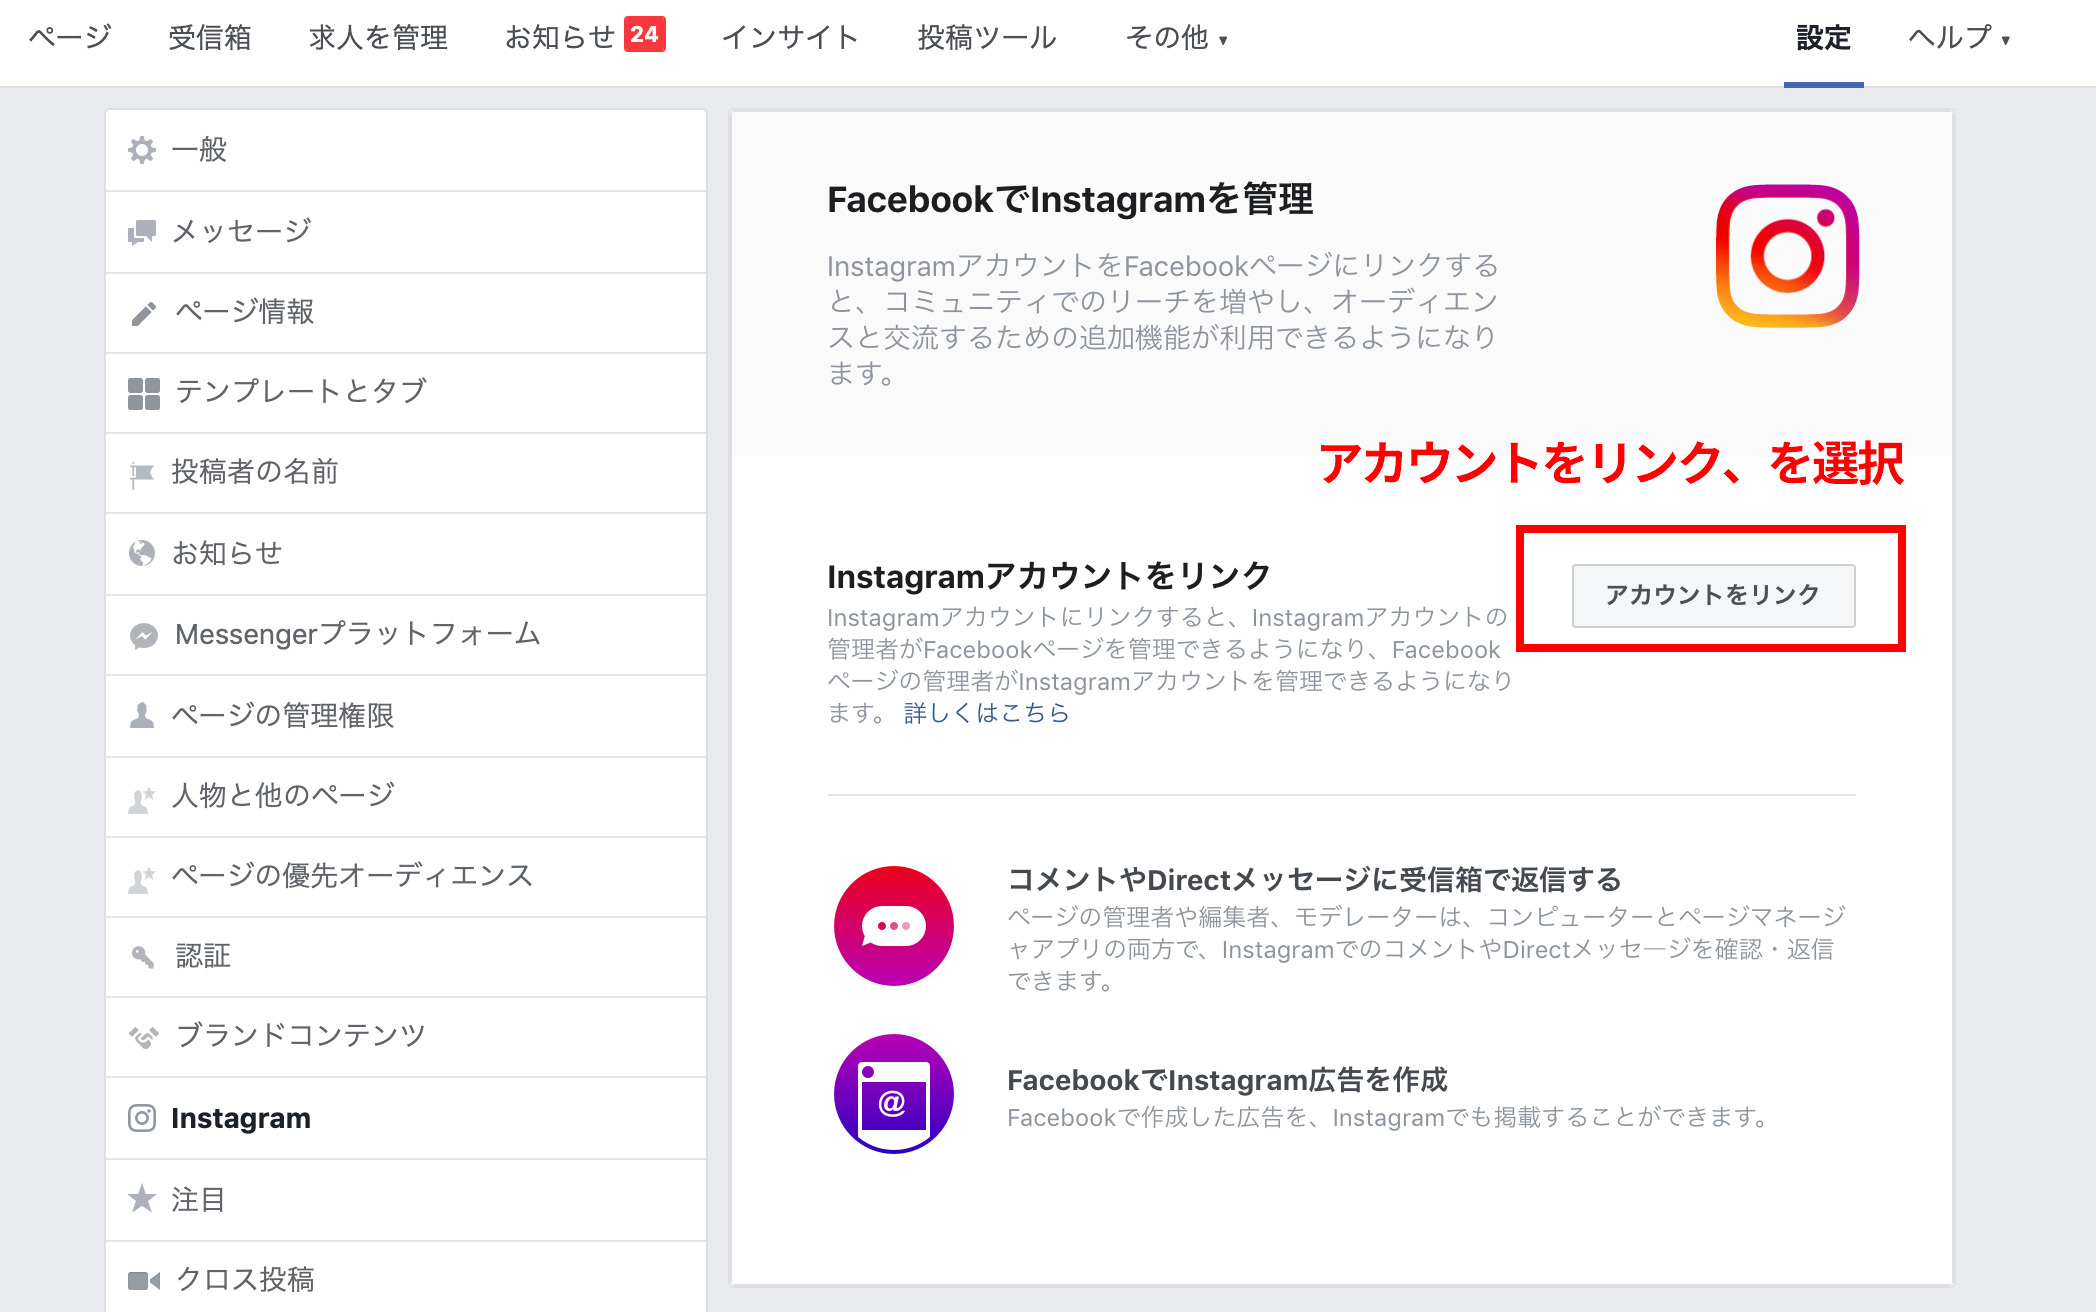 InstagramビジネスアカウントとFaceBookページの連携